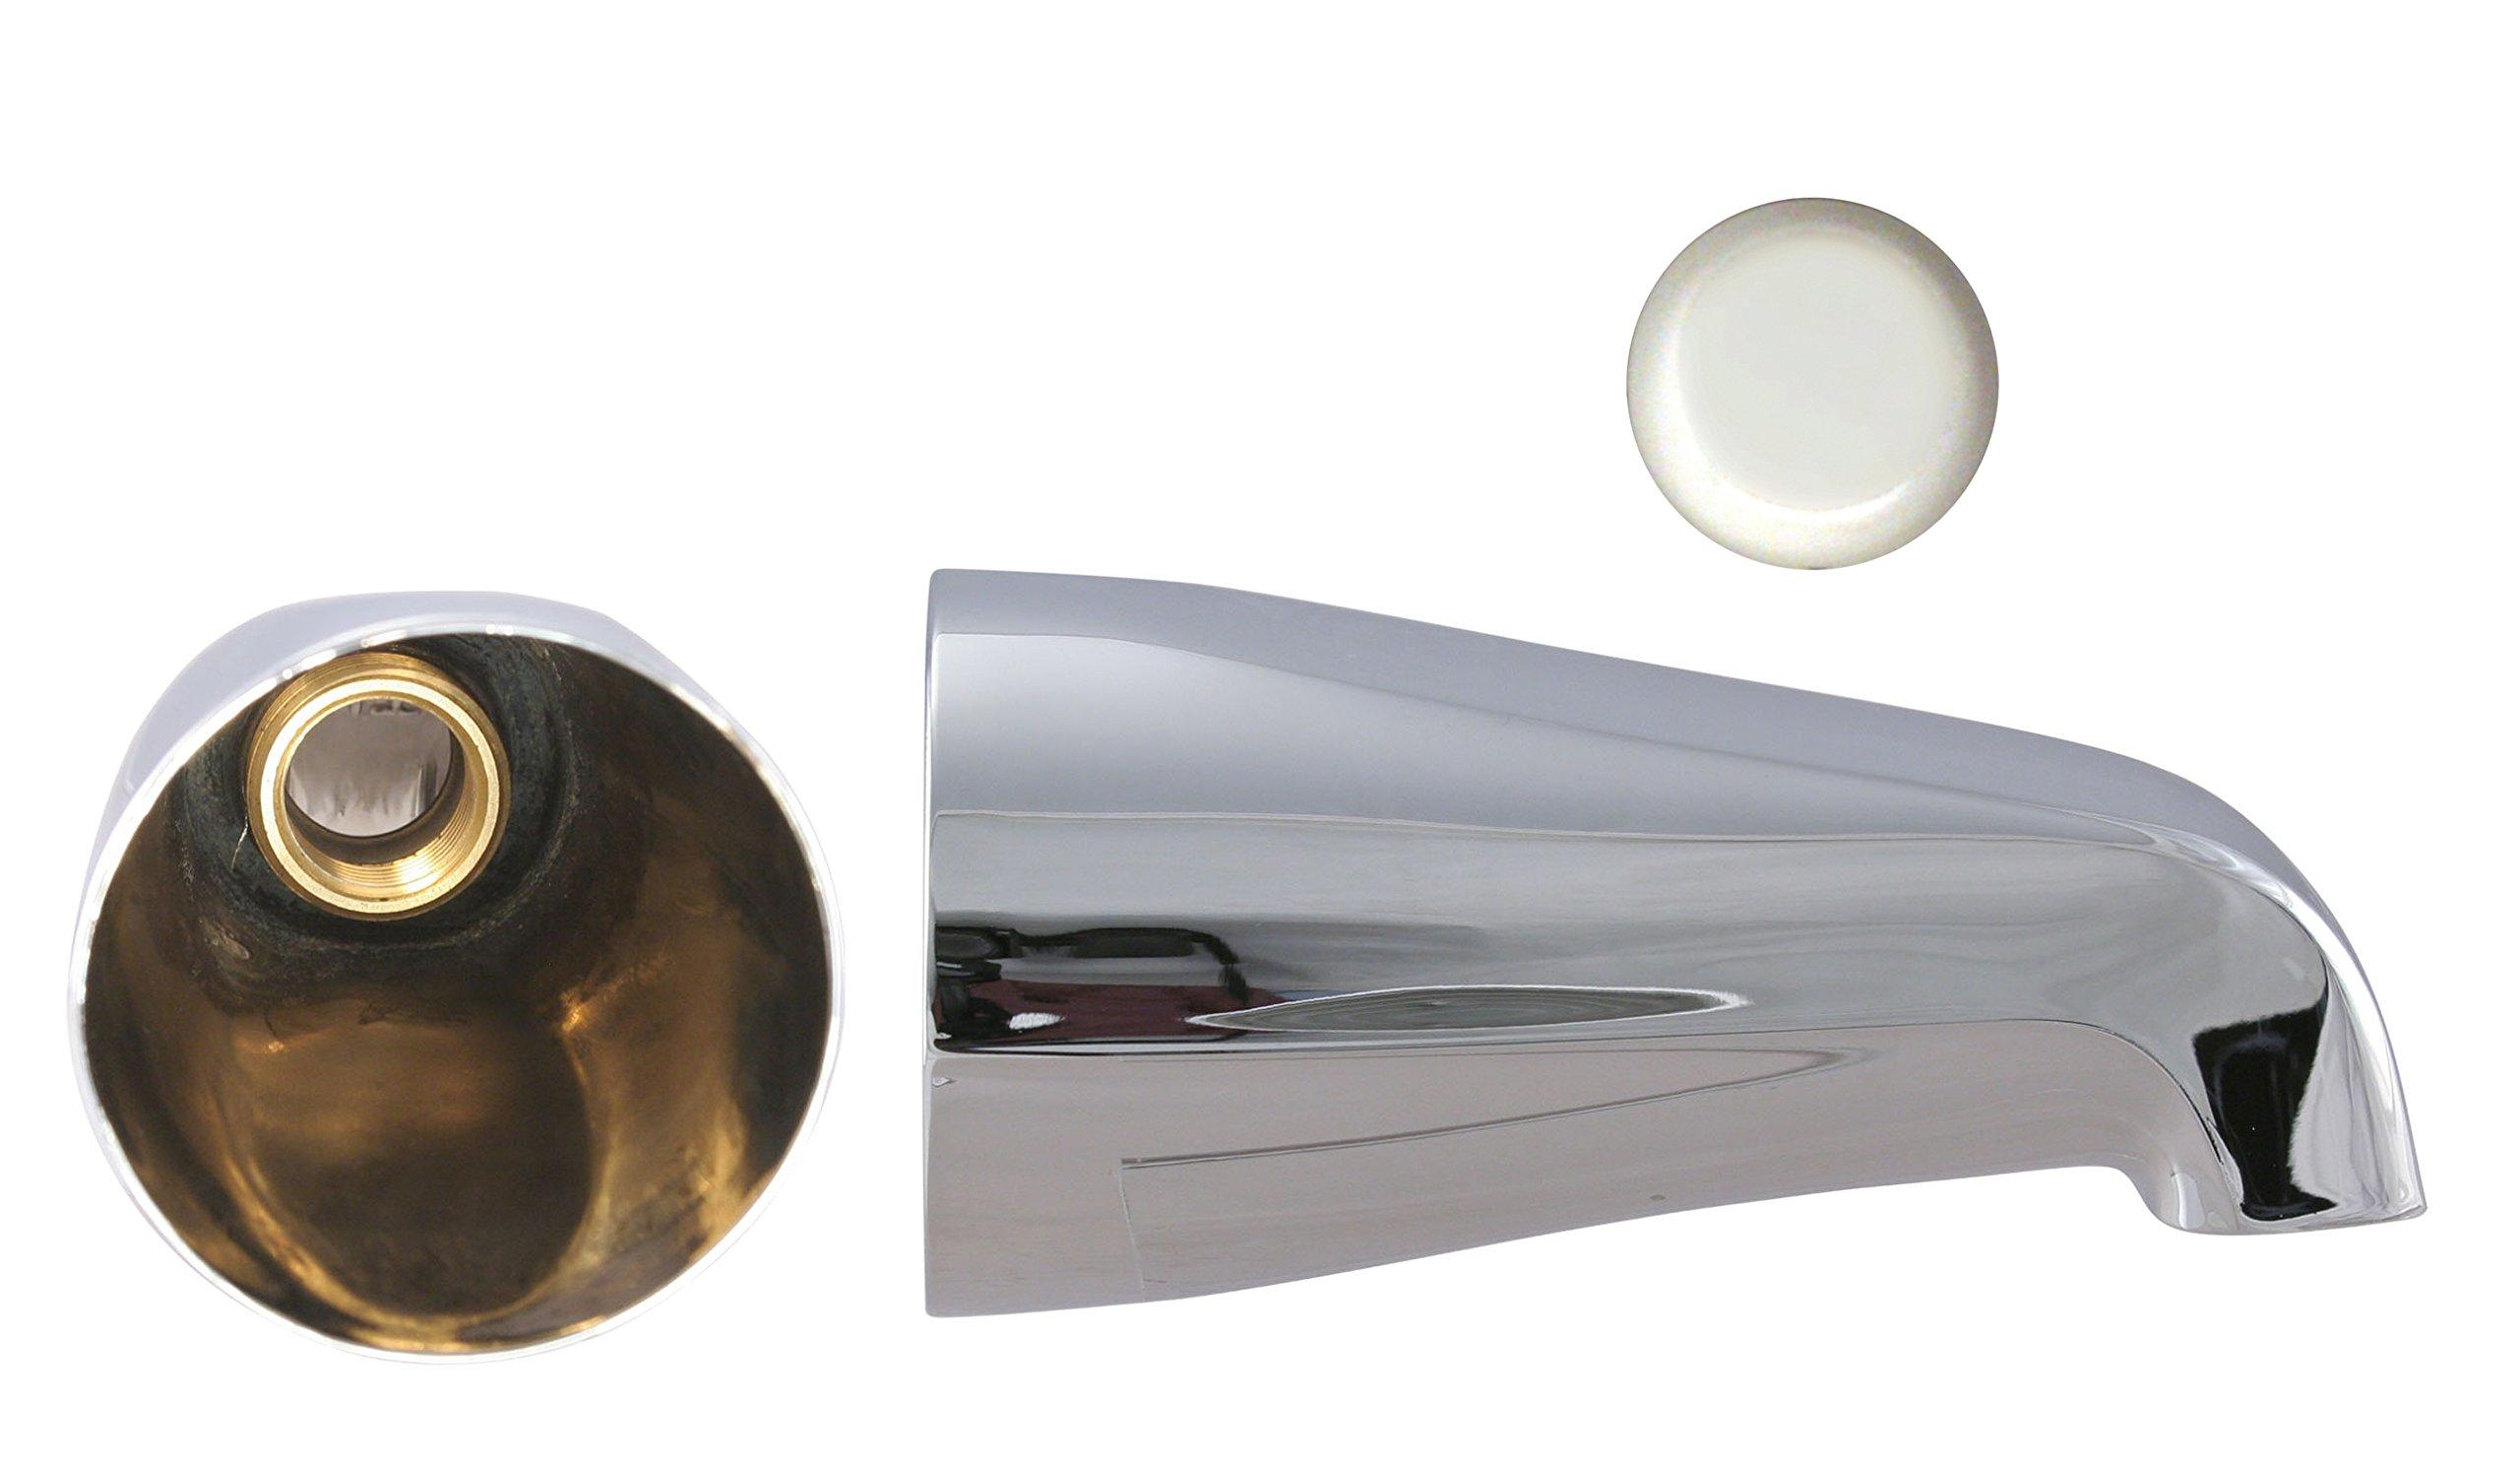 Westbrass E531-2F-WH Zinc Front Conn. Tub Spout 3/4'', White